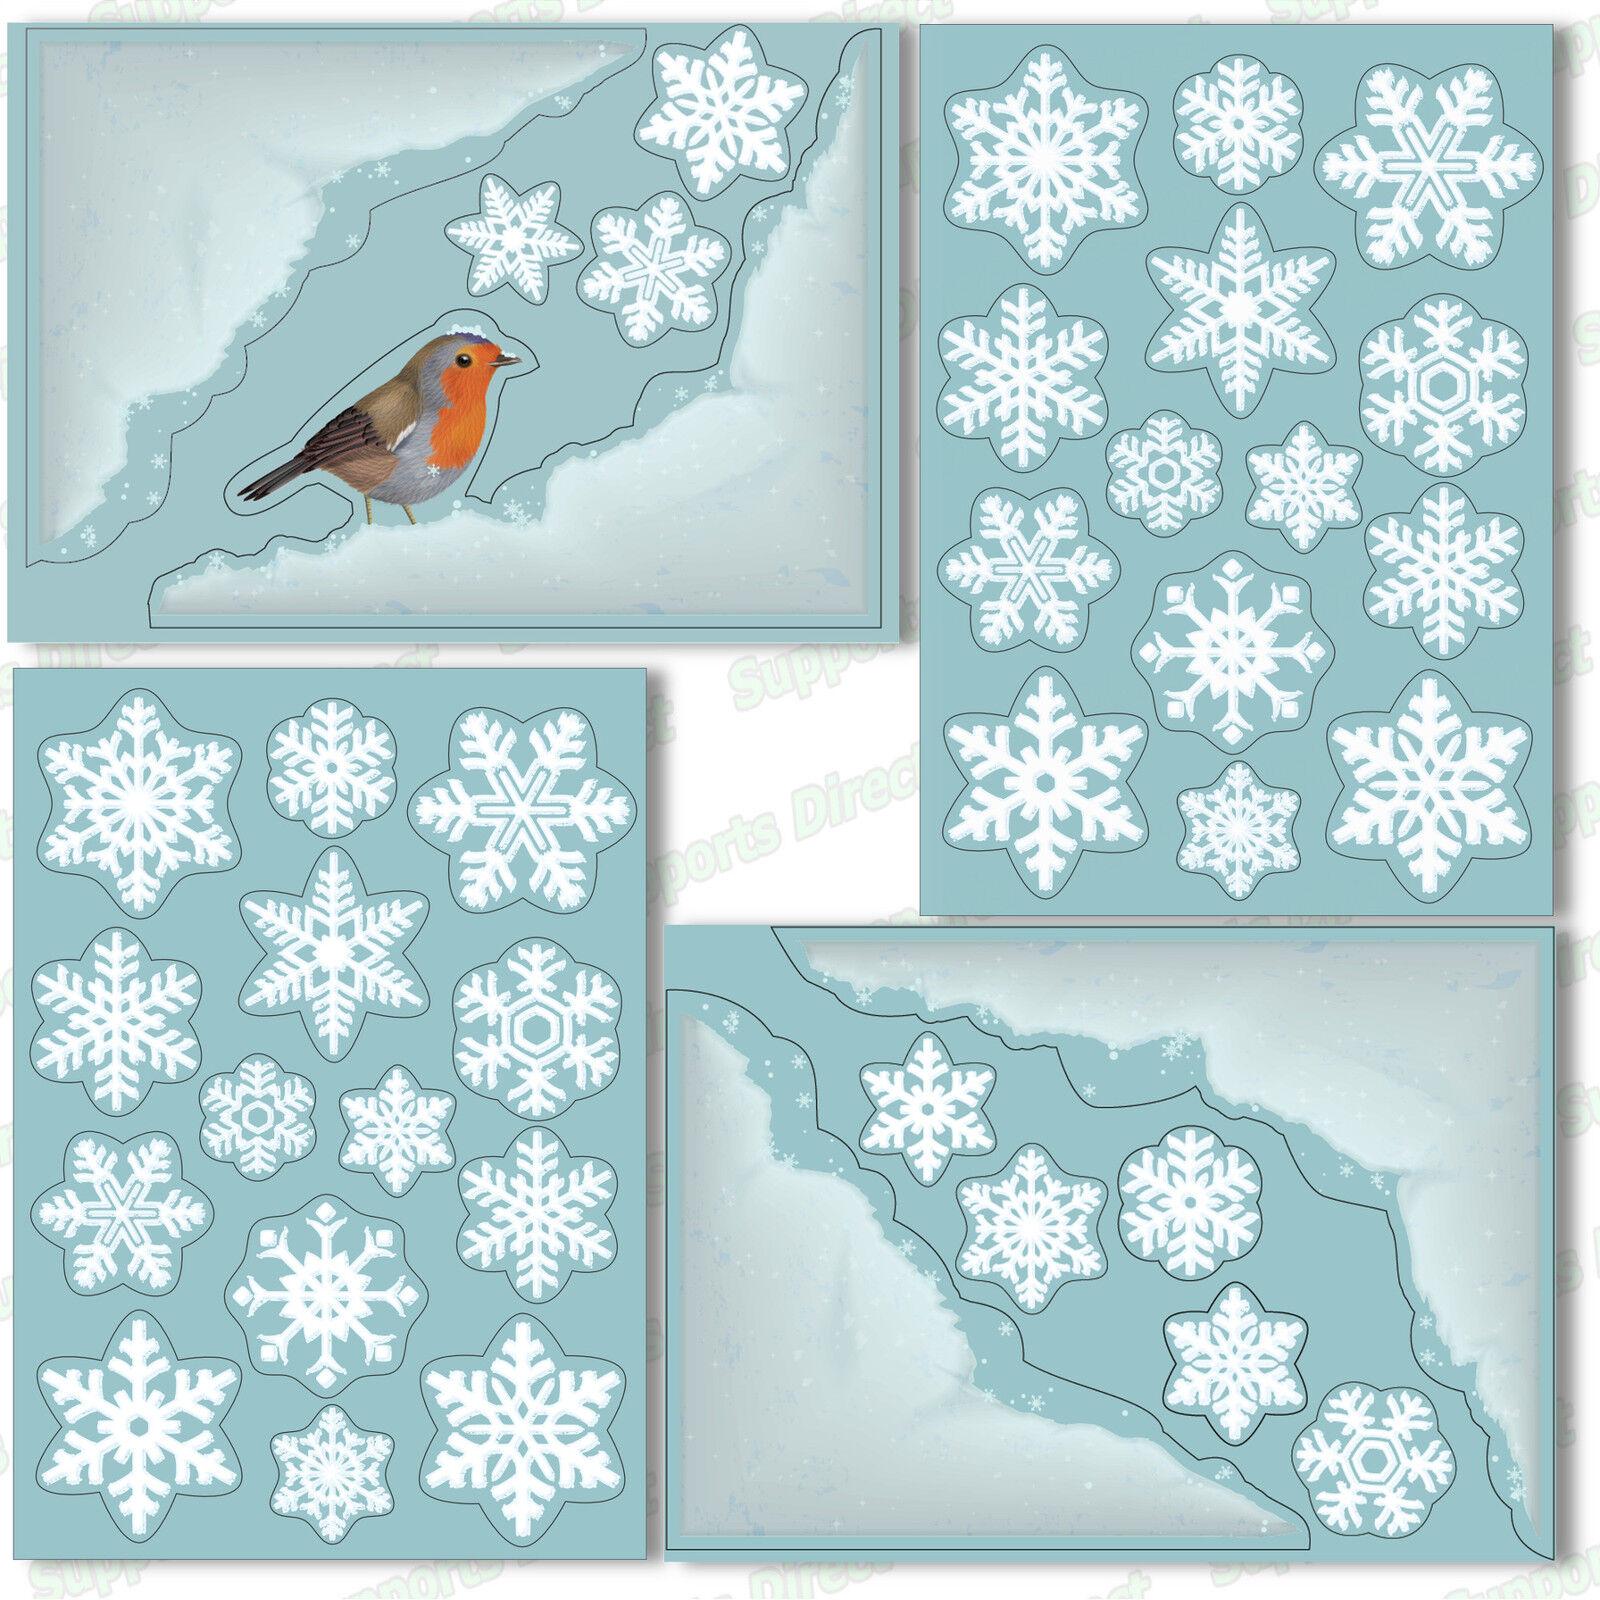 2 Star Snowflake Glitter Window Stickers Christmas Festive Decor Cling Frozen